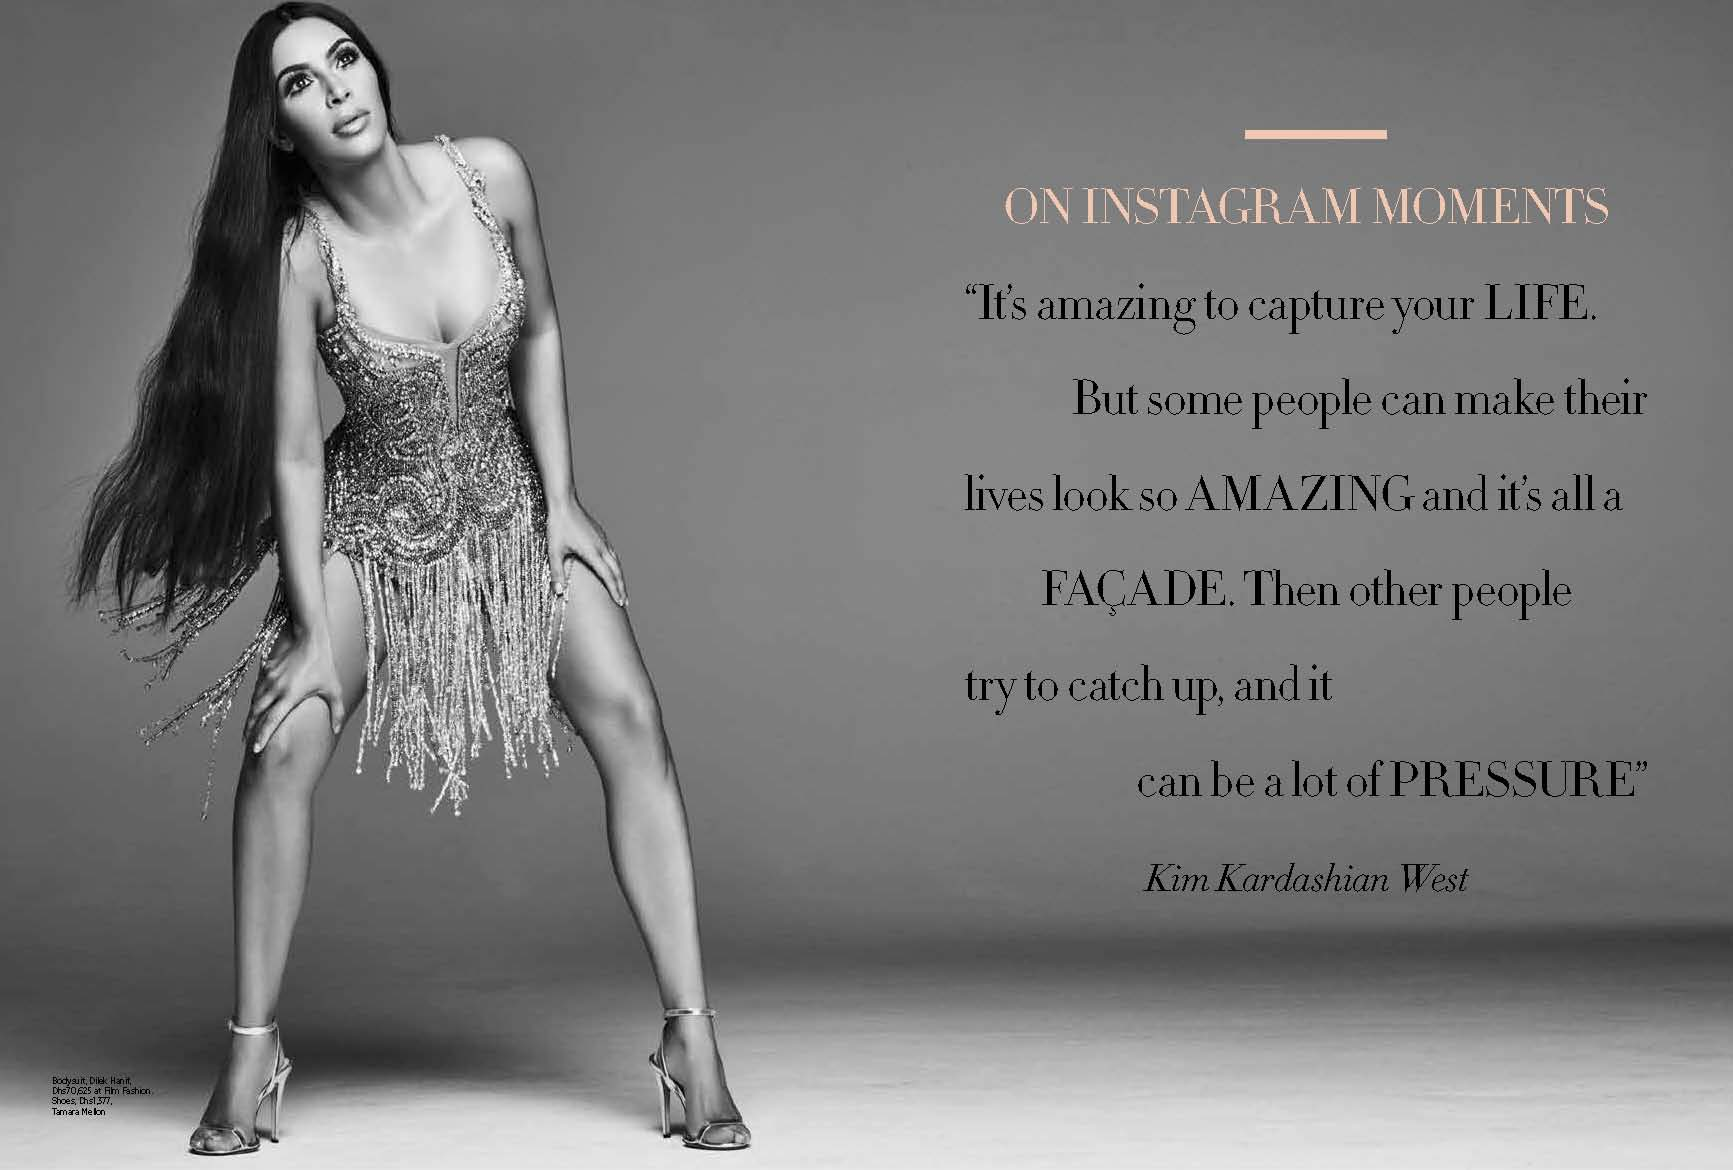 Kim Kardashian West, September 2017 3.jpg